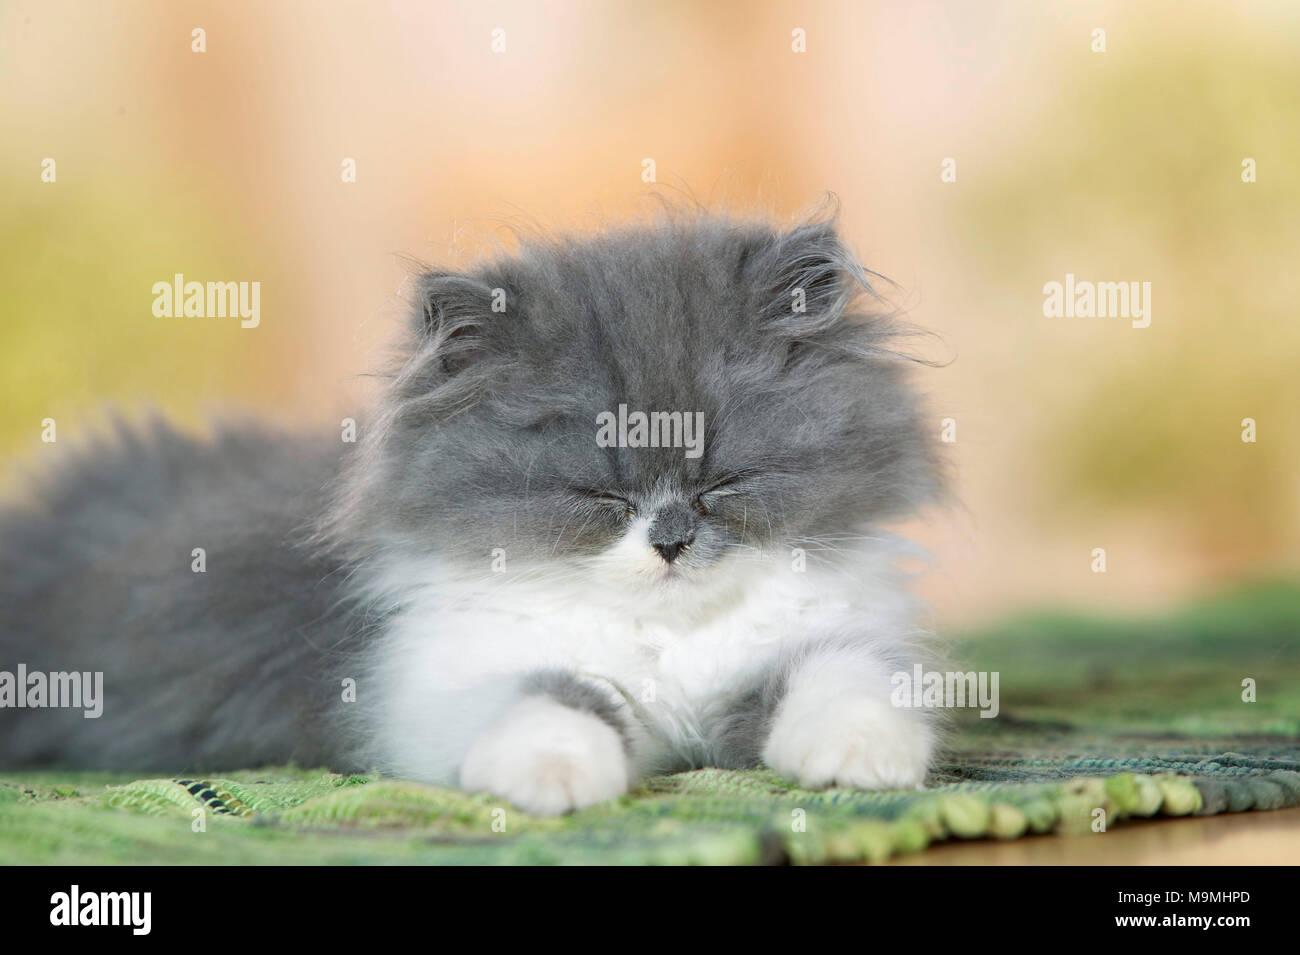 Persian Cat. Kitten lying on a carpet, dozing. Germany. - Stock Image